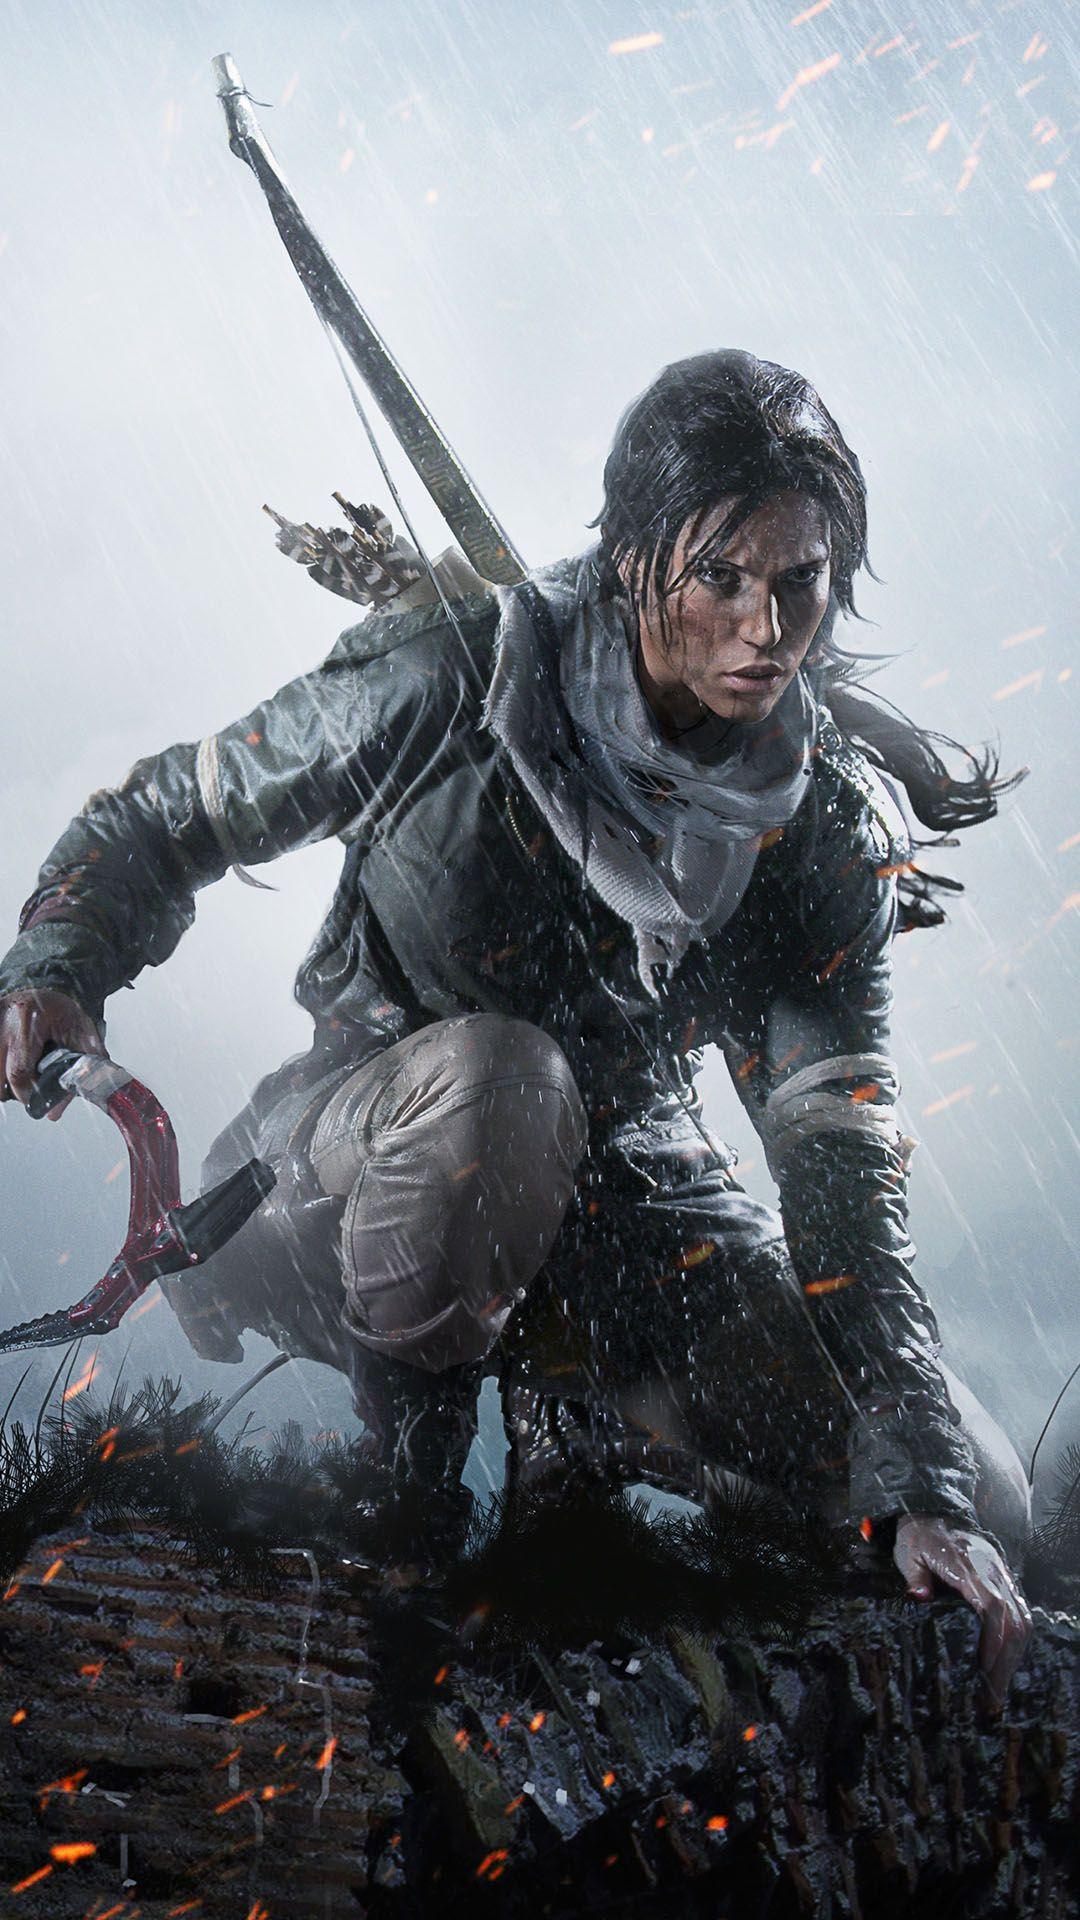 Lara Croft Hd Wallpaper For Iphone Usefulcraft Com Tomb Raider Wallpaper Tomb Raider Raiders Wallpaper